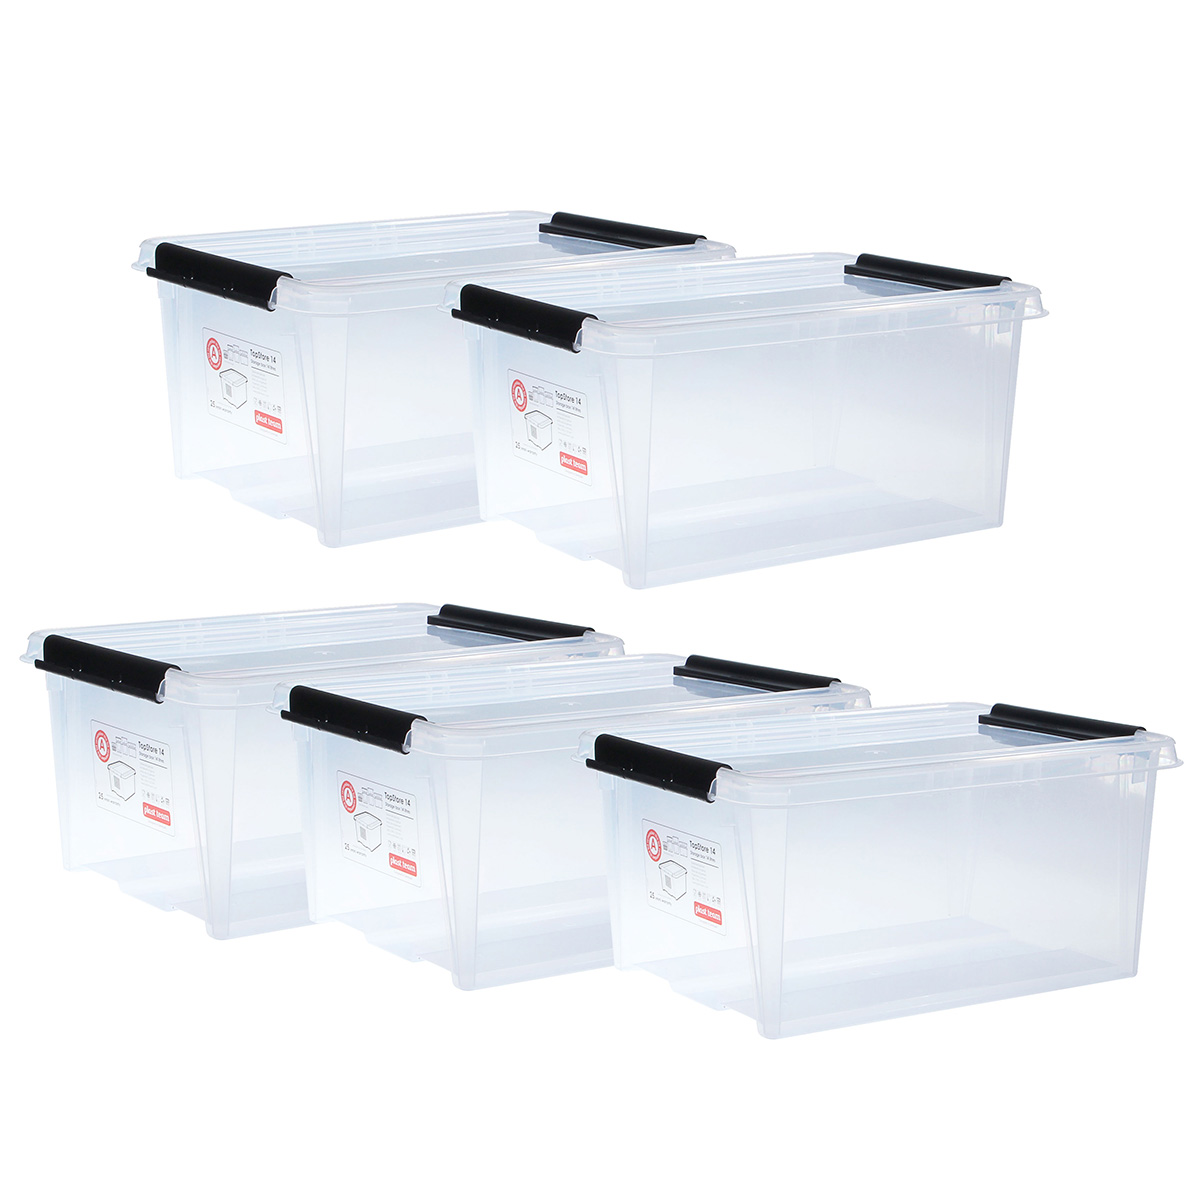 Top store opbevaringskasser - 14 liter